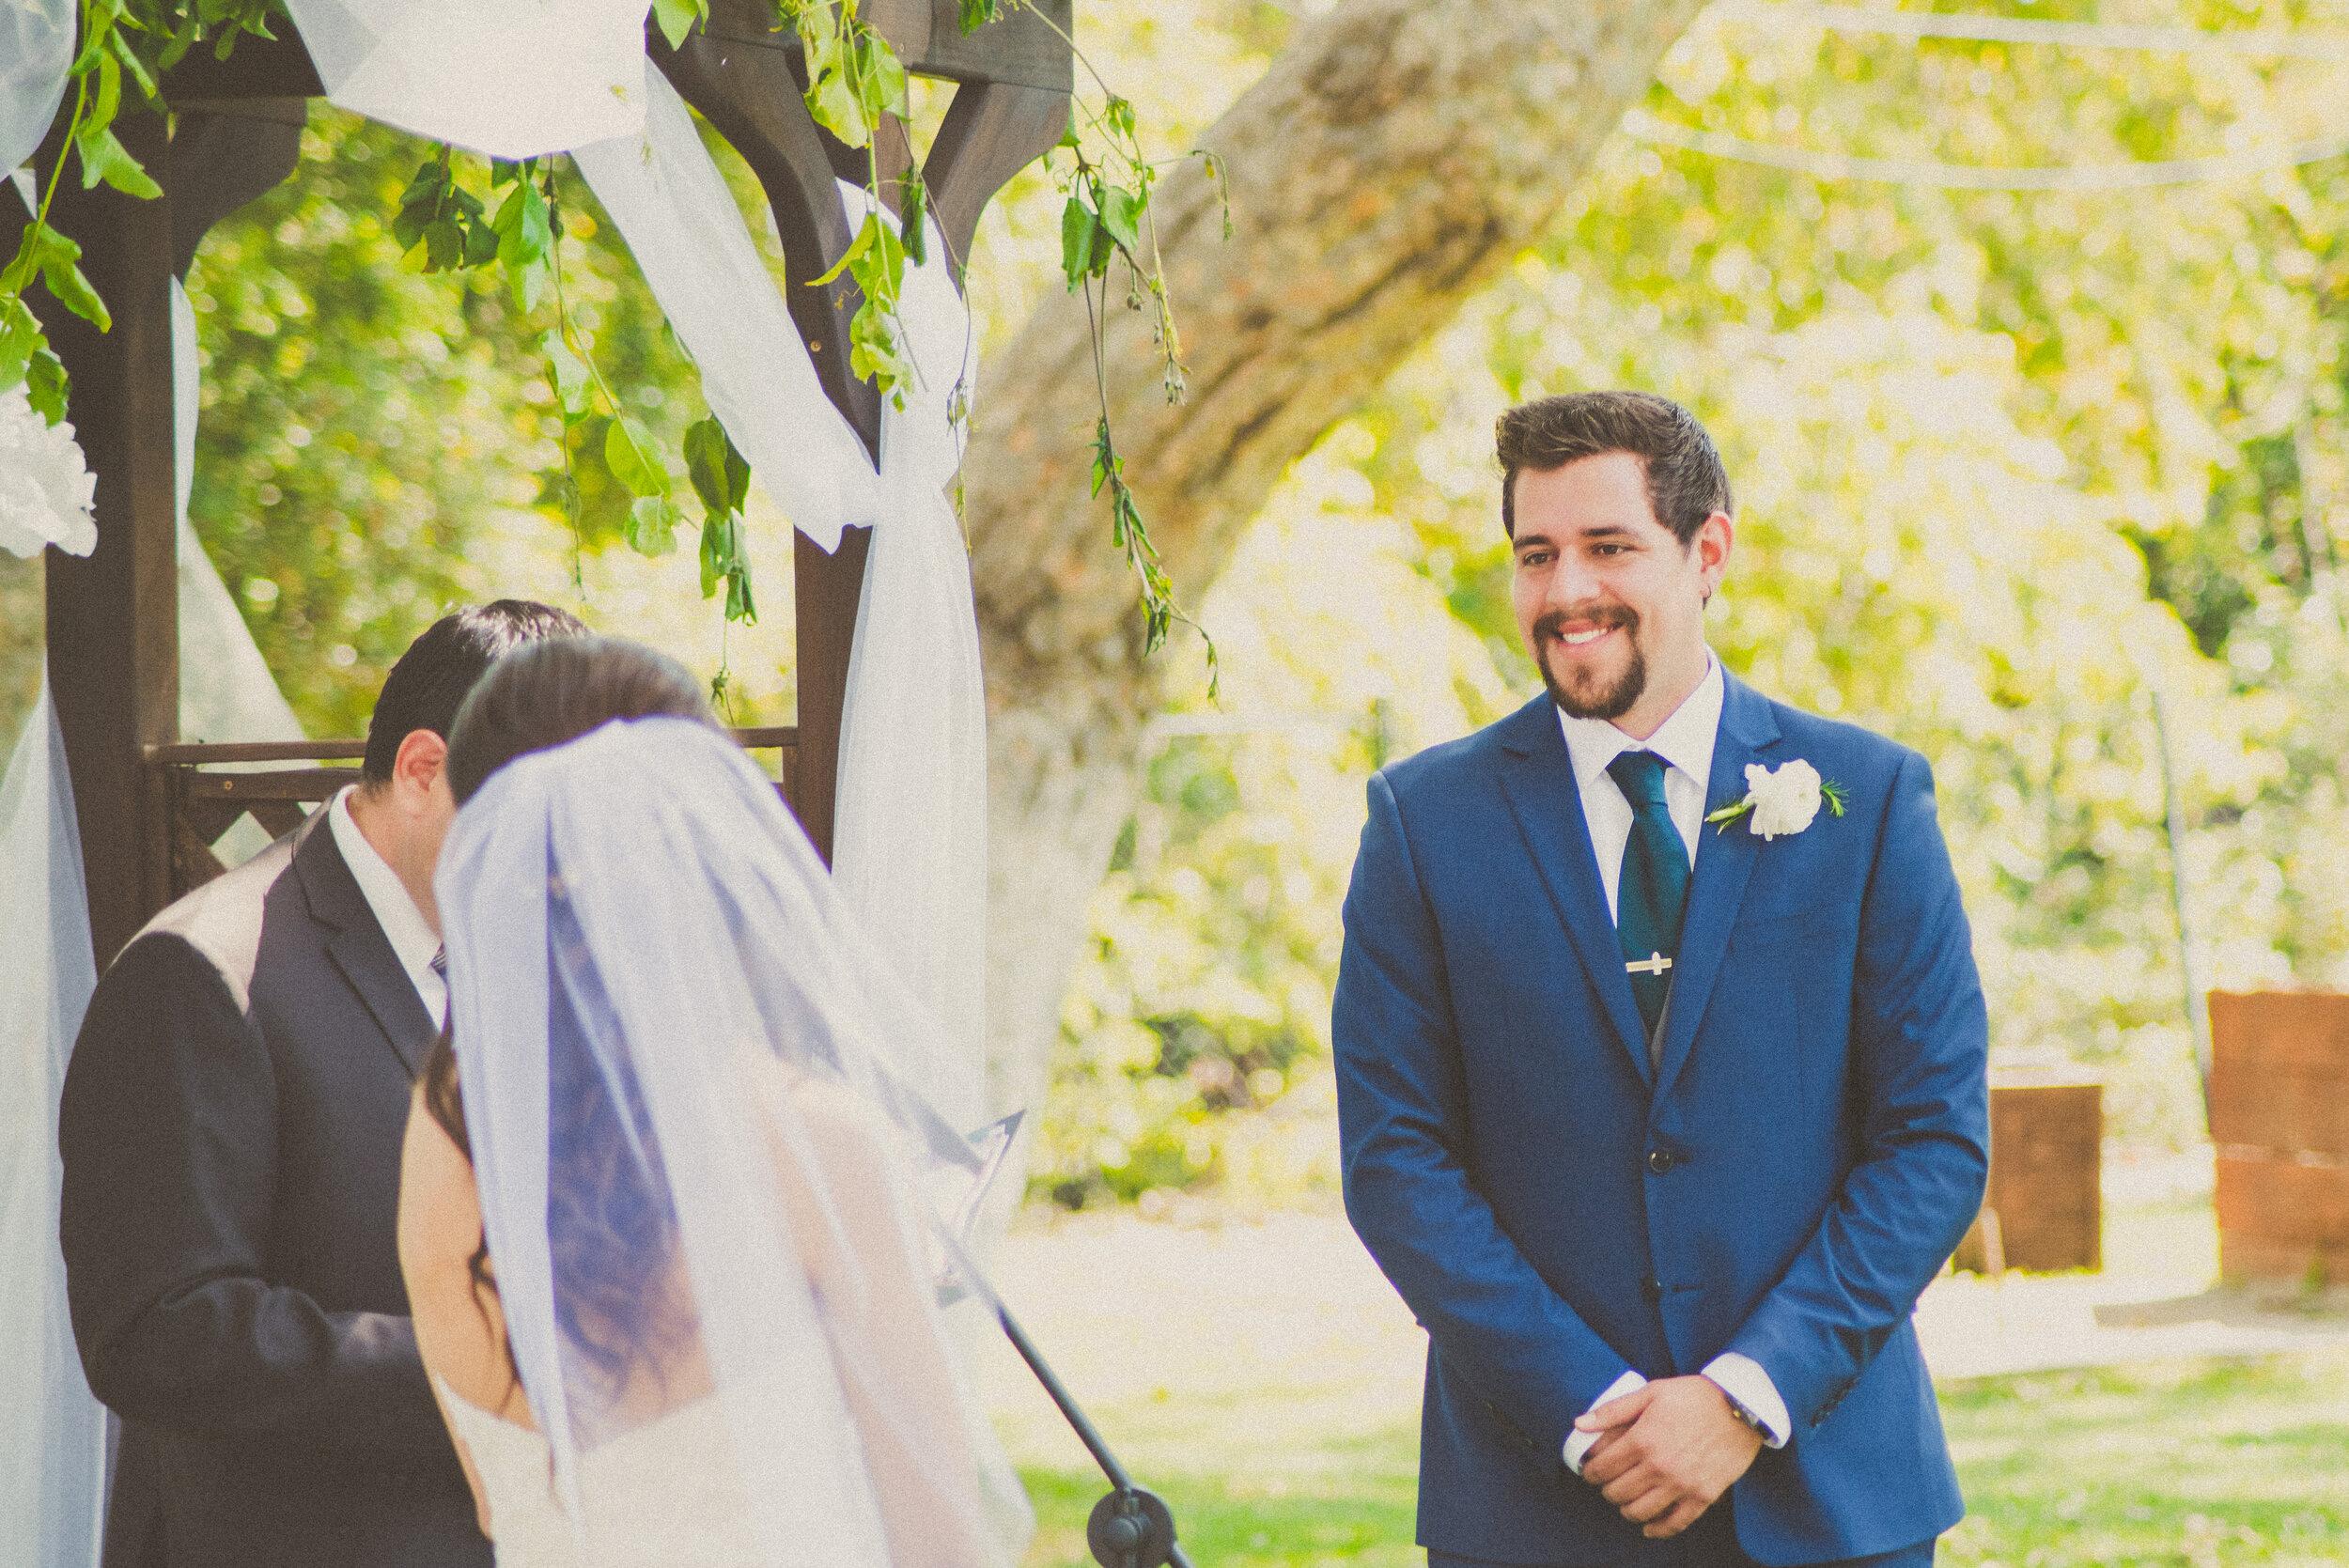 Loza Wedding - Ceremony-43.jpg